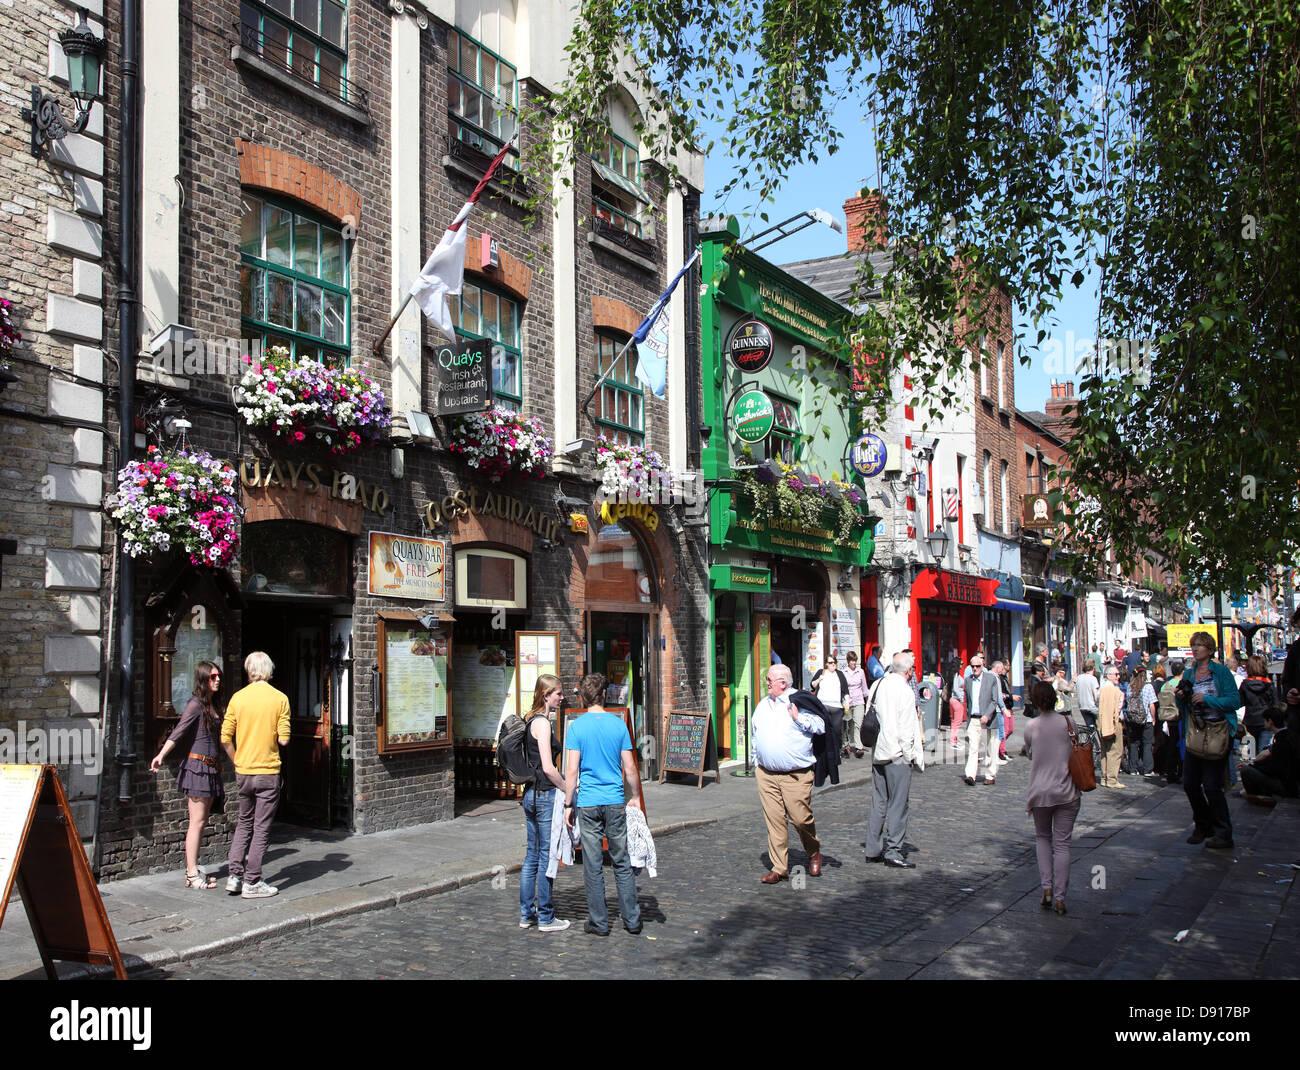 Summer day in Temple Bar, Dublin's Left Bank quarter, Ireland - Stock Image